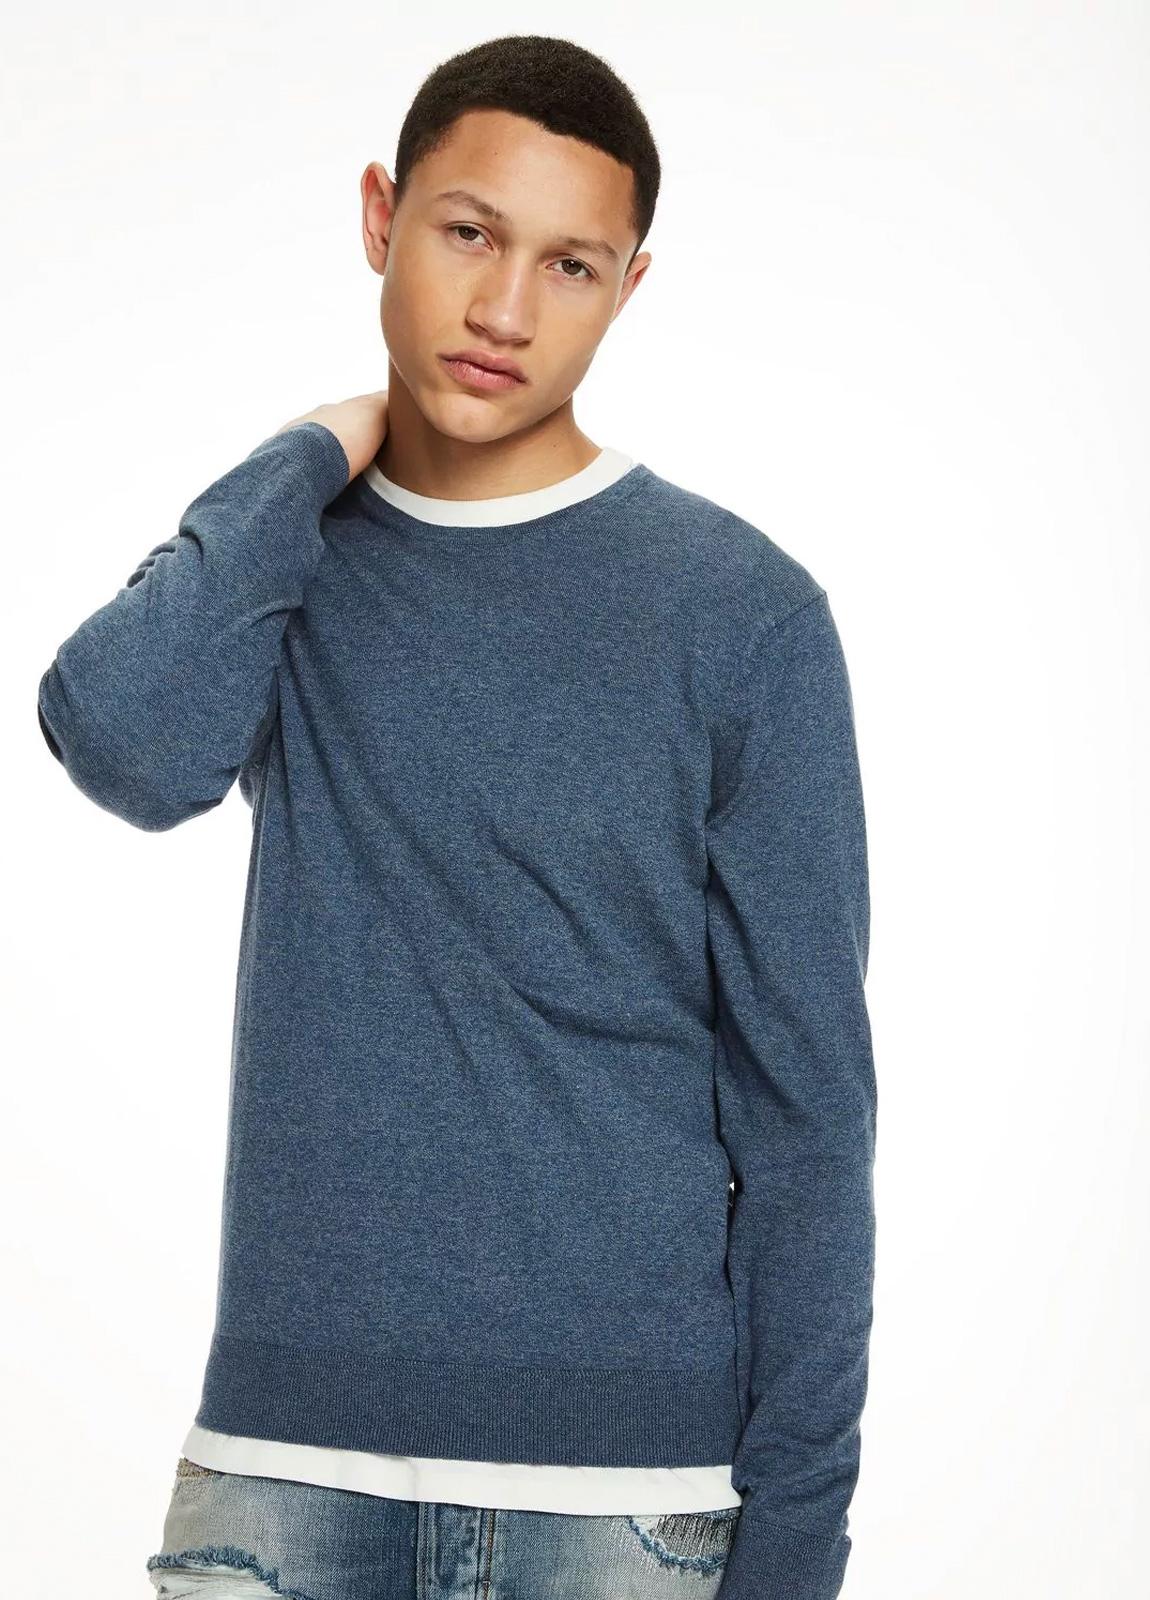 Jersey cuello redondo color azul. 95% Algodón 5% Cashmere. - Ítem1